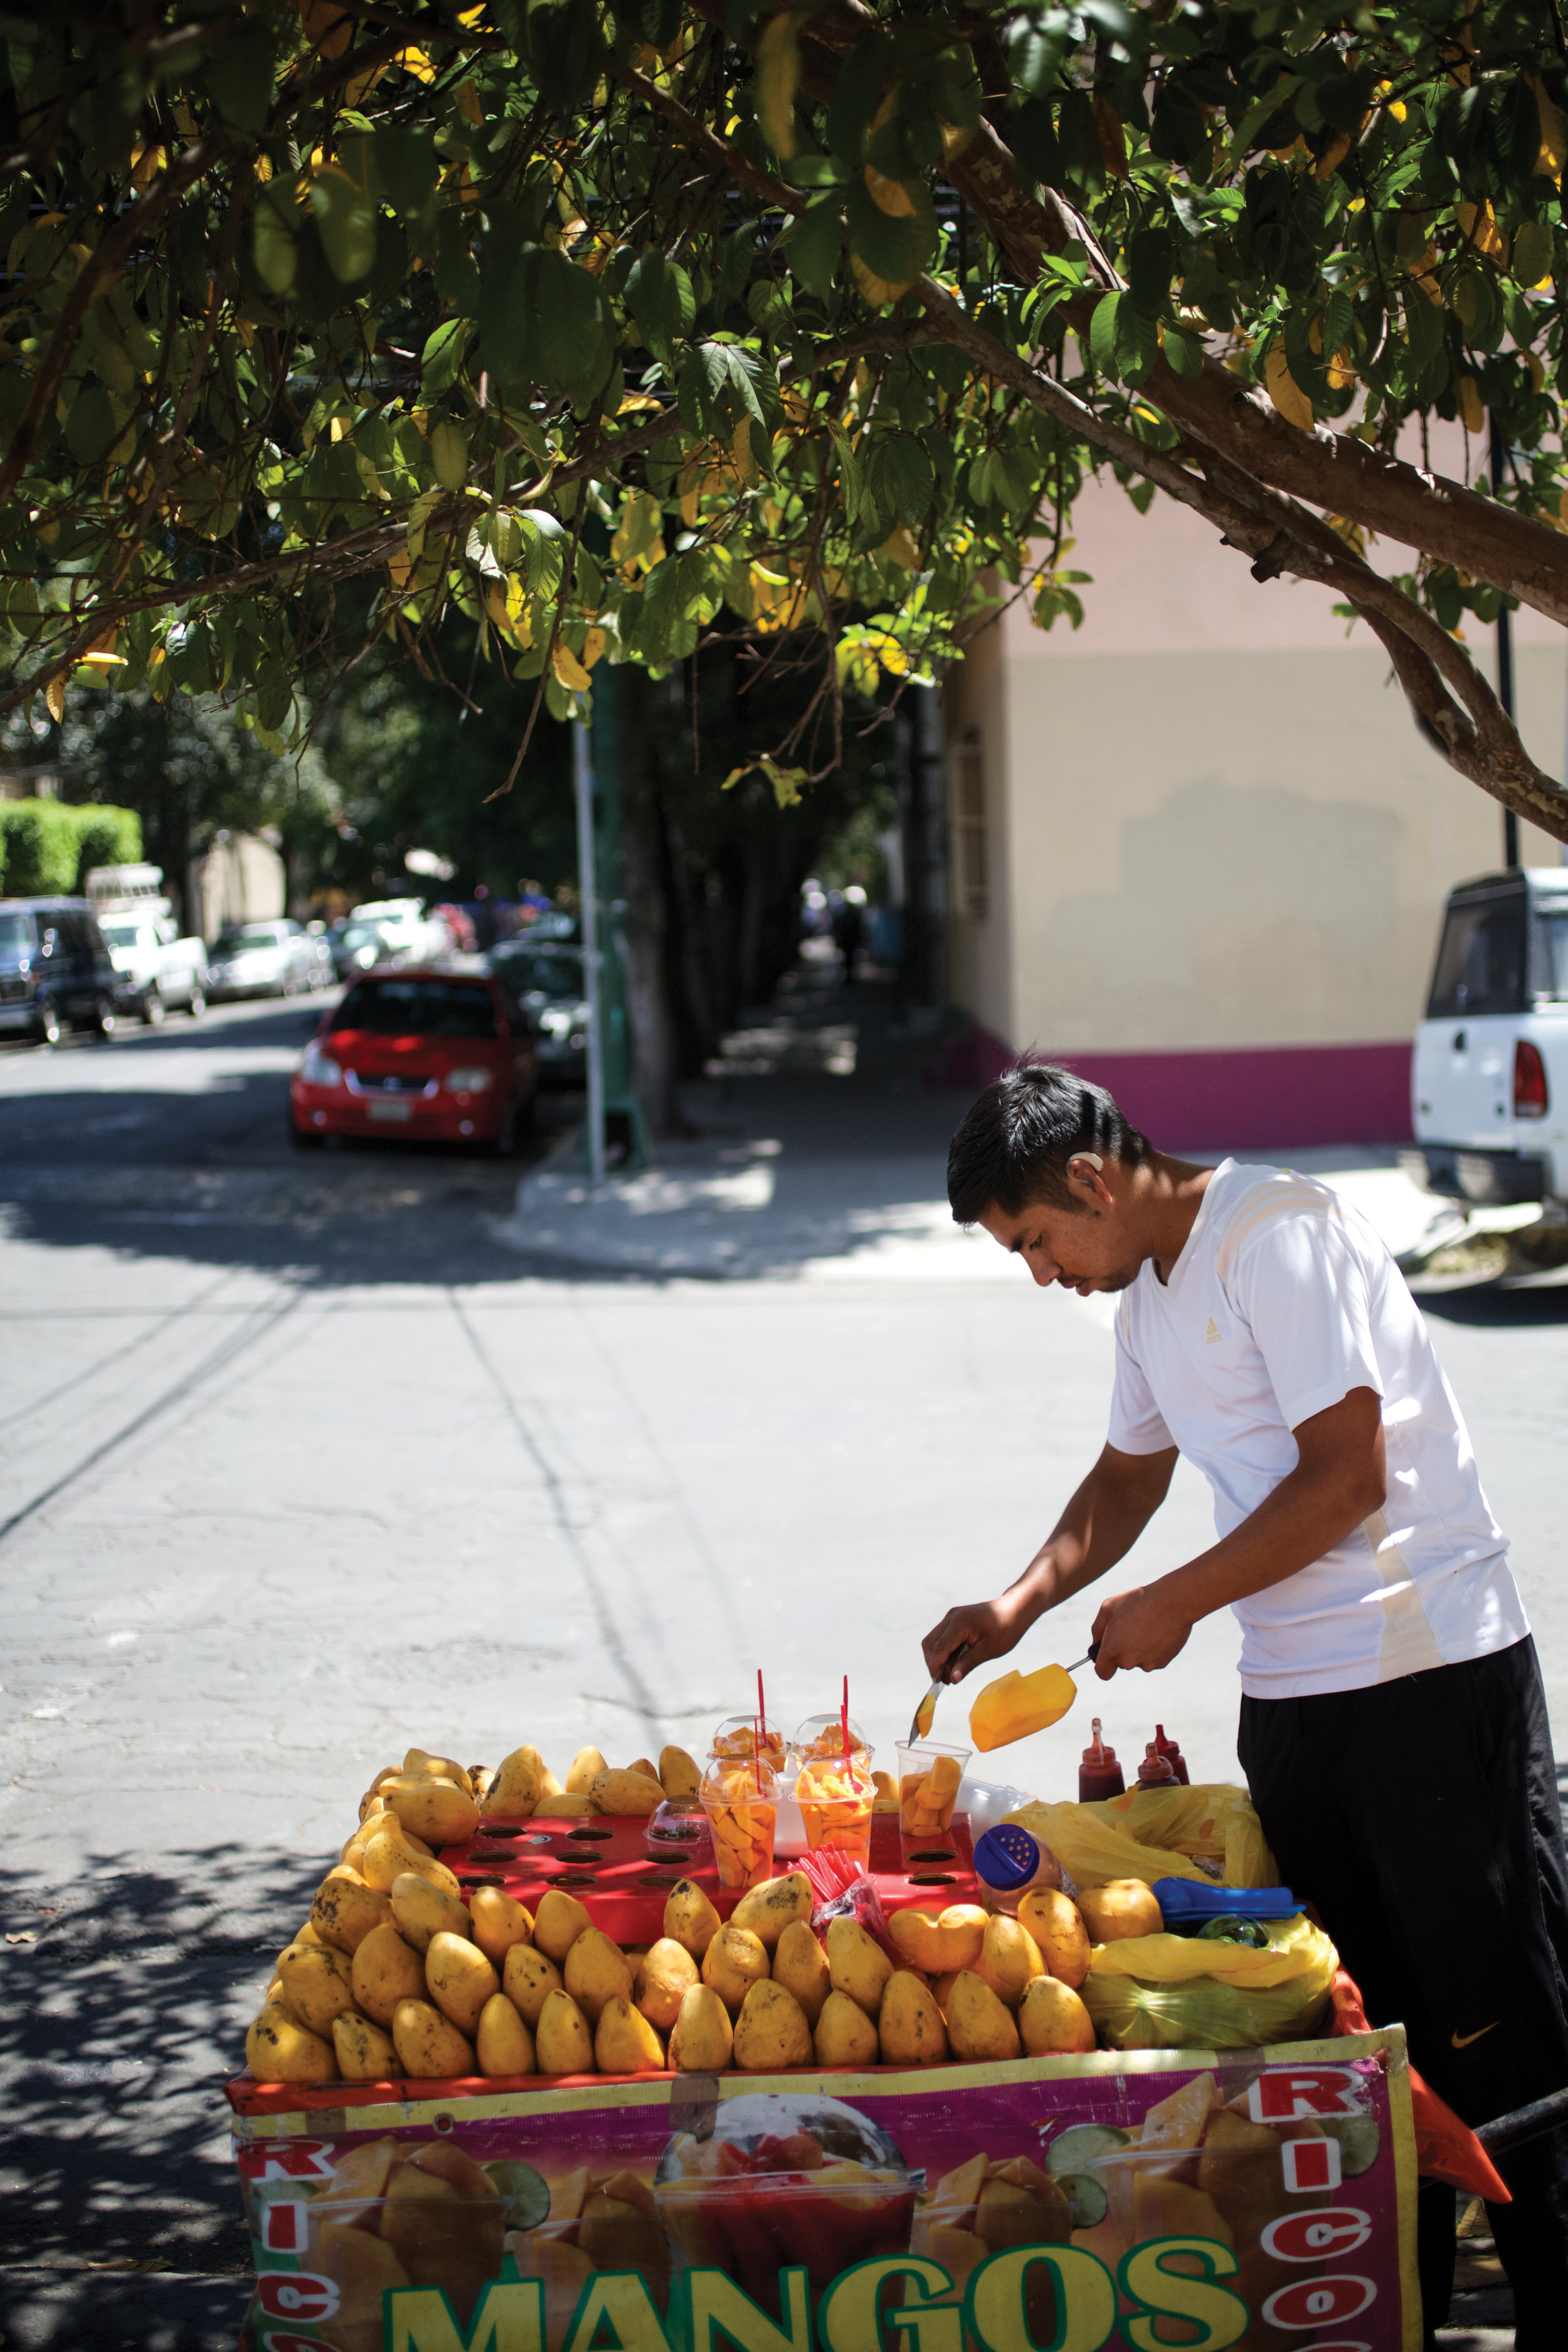 Copy of Mexico City street vendor selling mangos